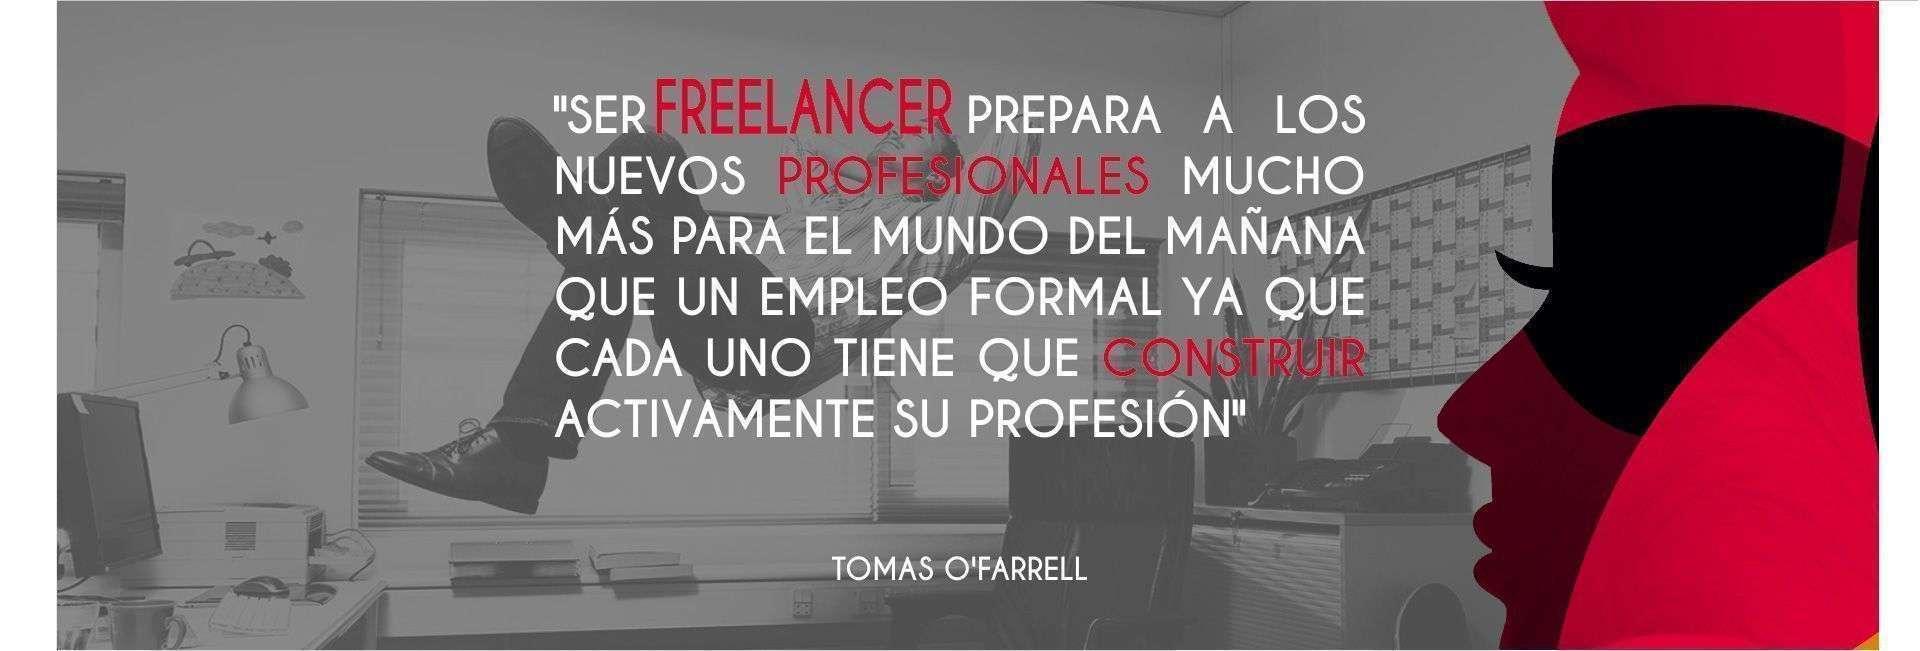 "Tomás O'Farrell: ""Siendo freelancer tenés que emprender y construir activamente tu profesión"""